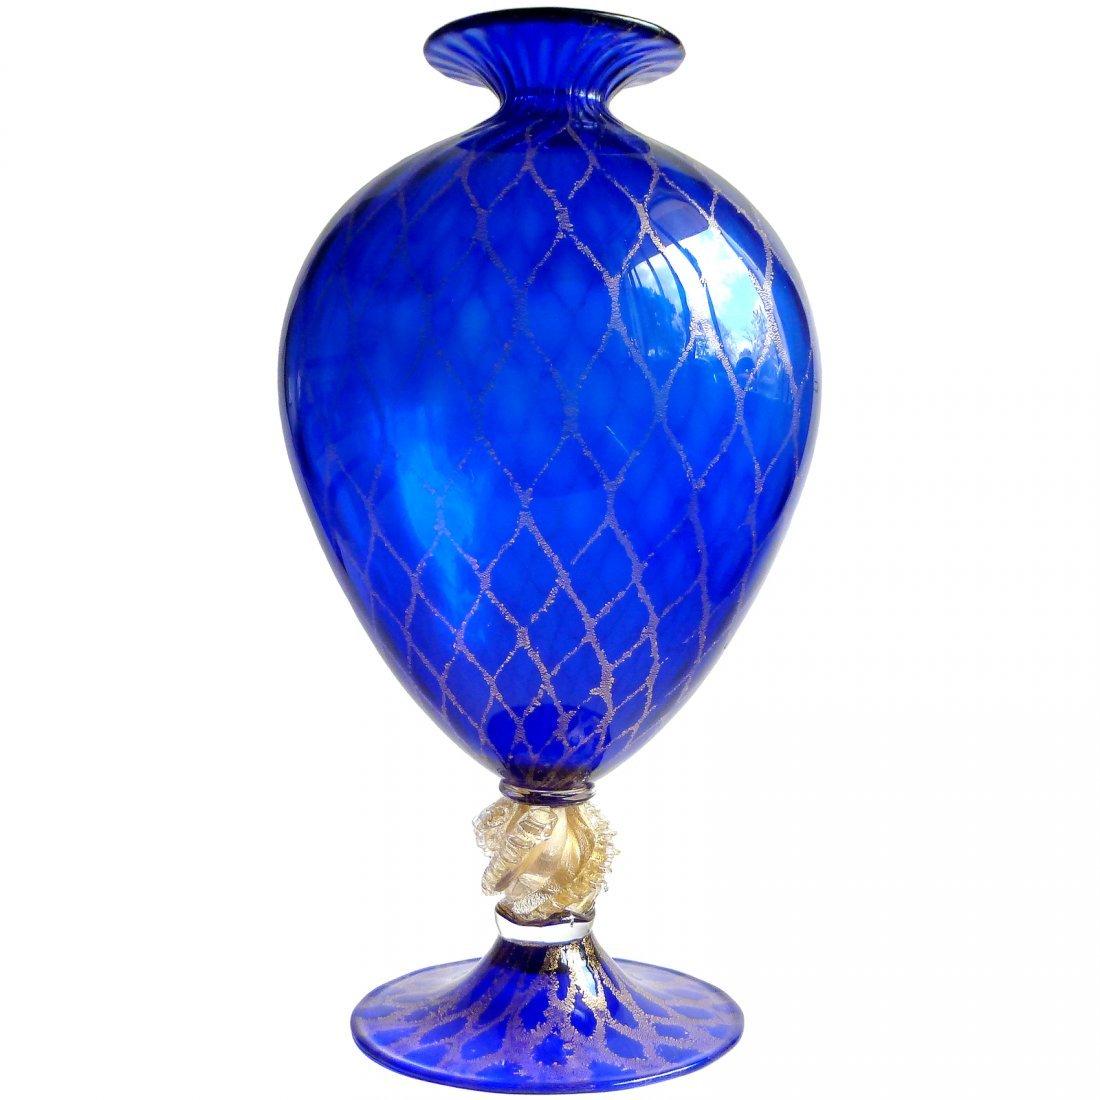 Nason Murano Sapphire Gold Flecks Flower Vase